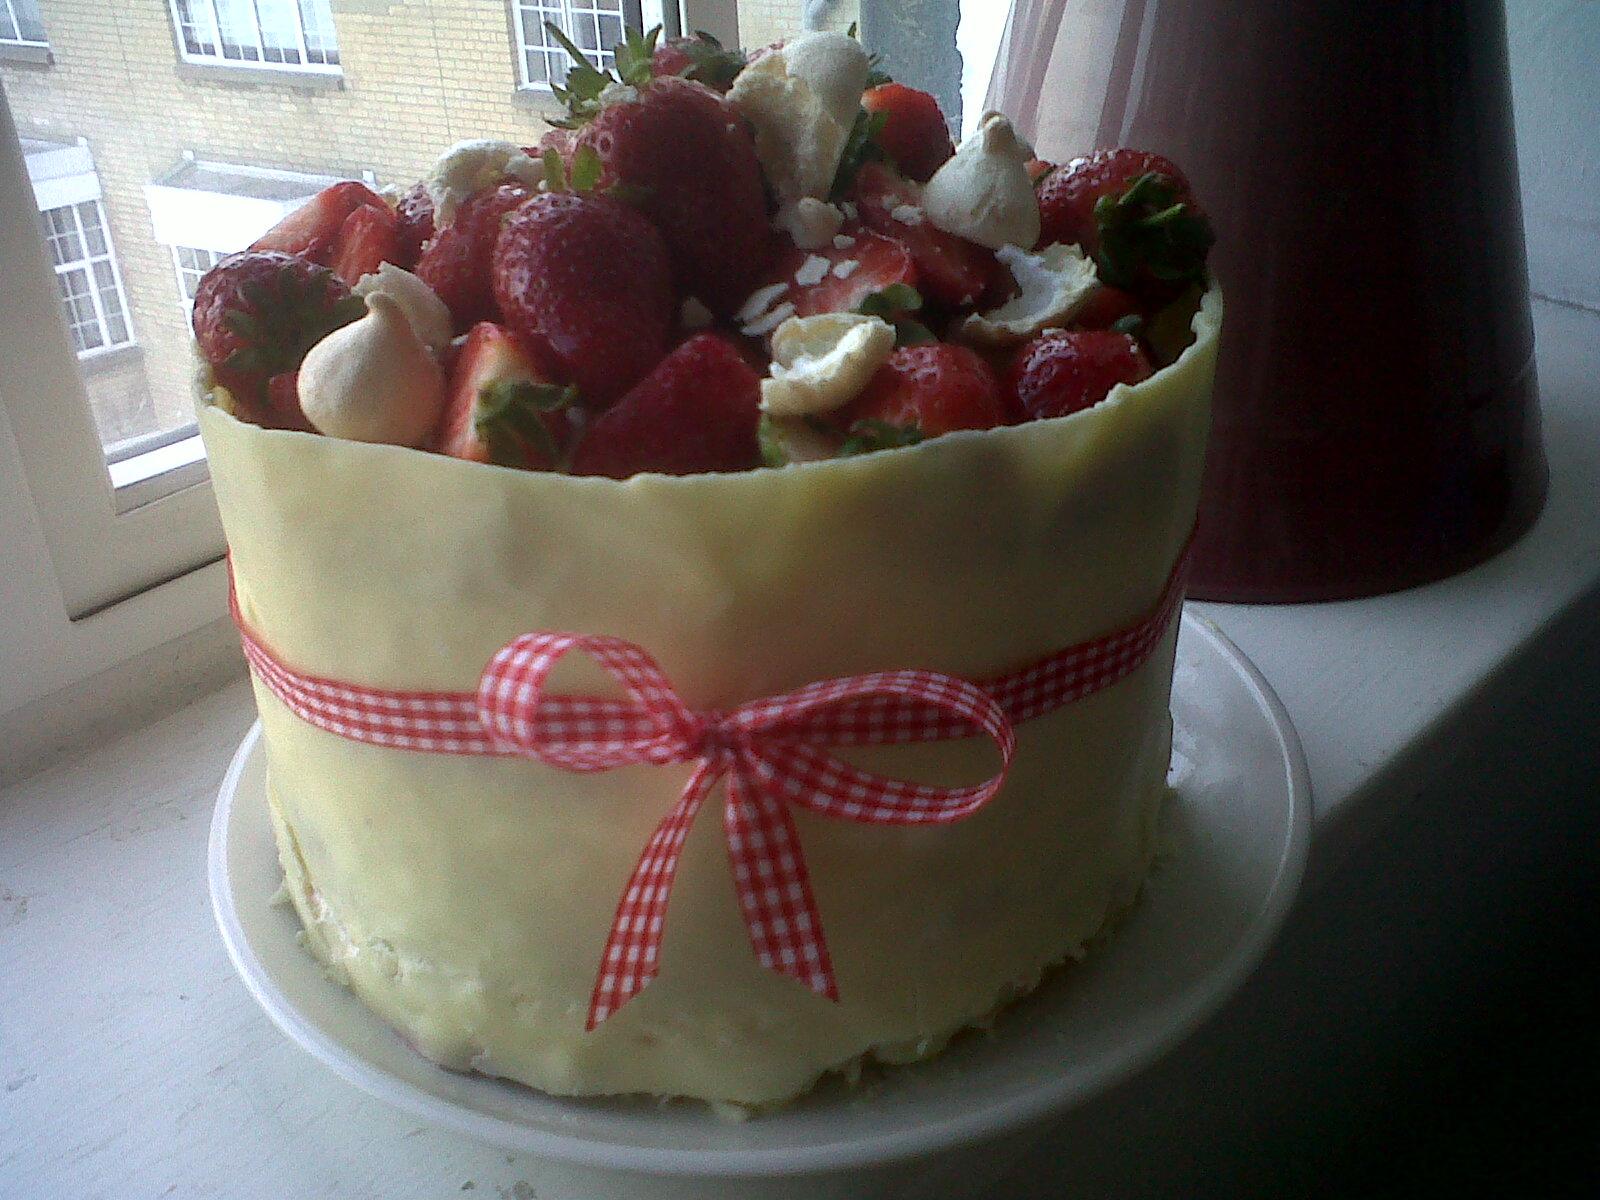 Tikustitches: Cake From Kedai Kek Jas